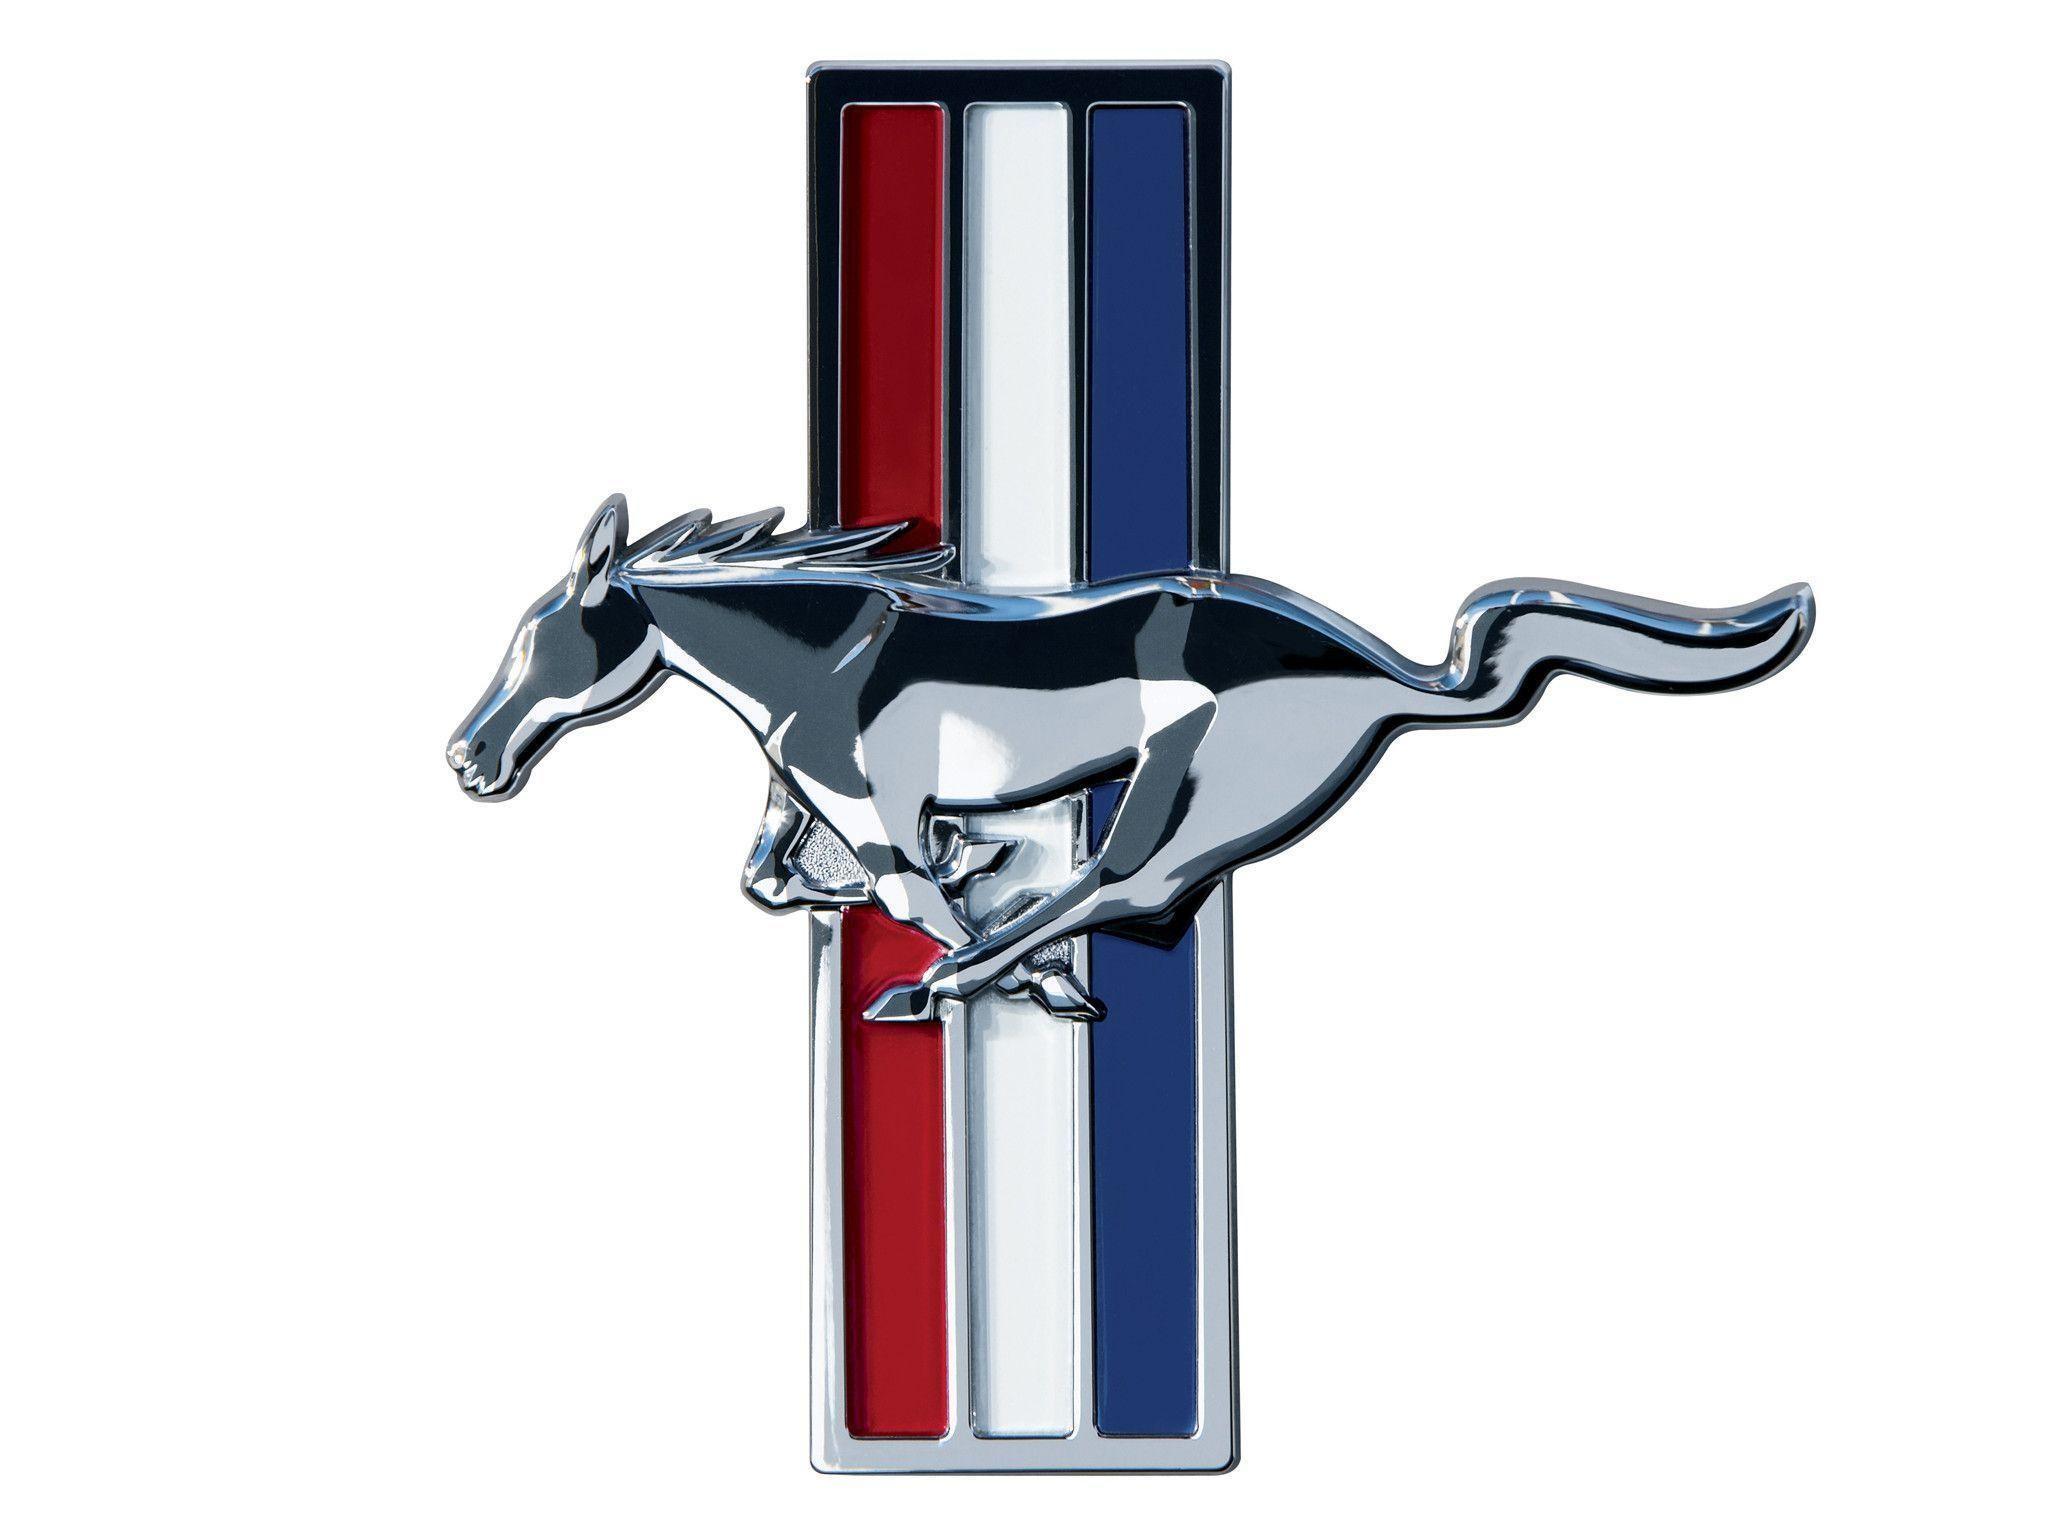 Mustang Logo Wallpaper | Wallpaper | Basic Background